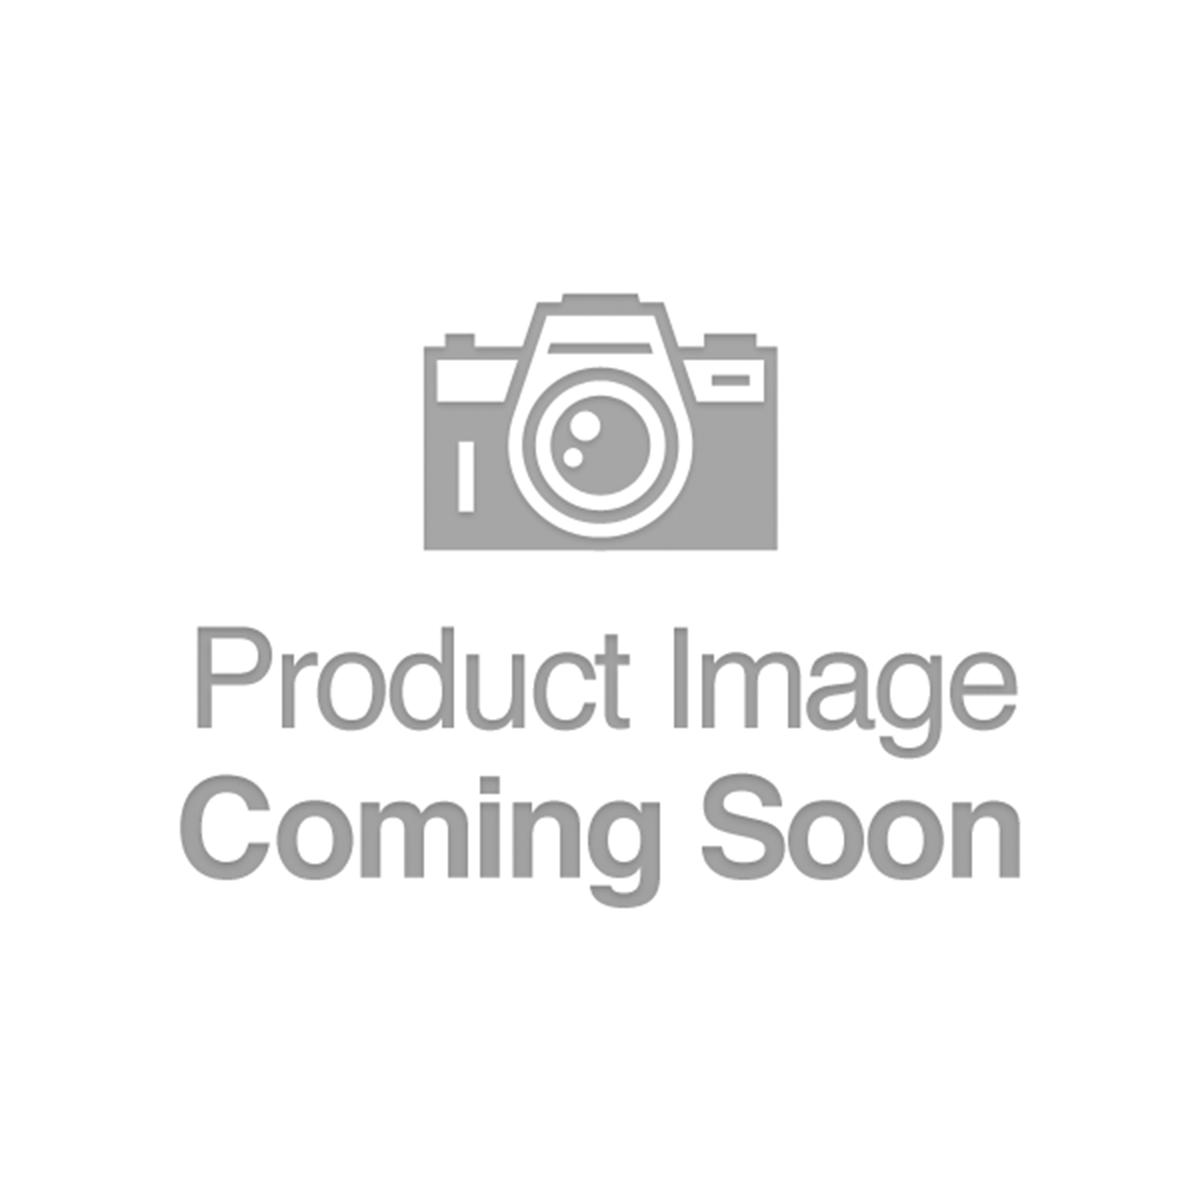 FR 148 $50 1862 Legal Tender PMG 25